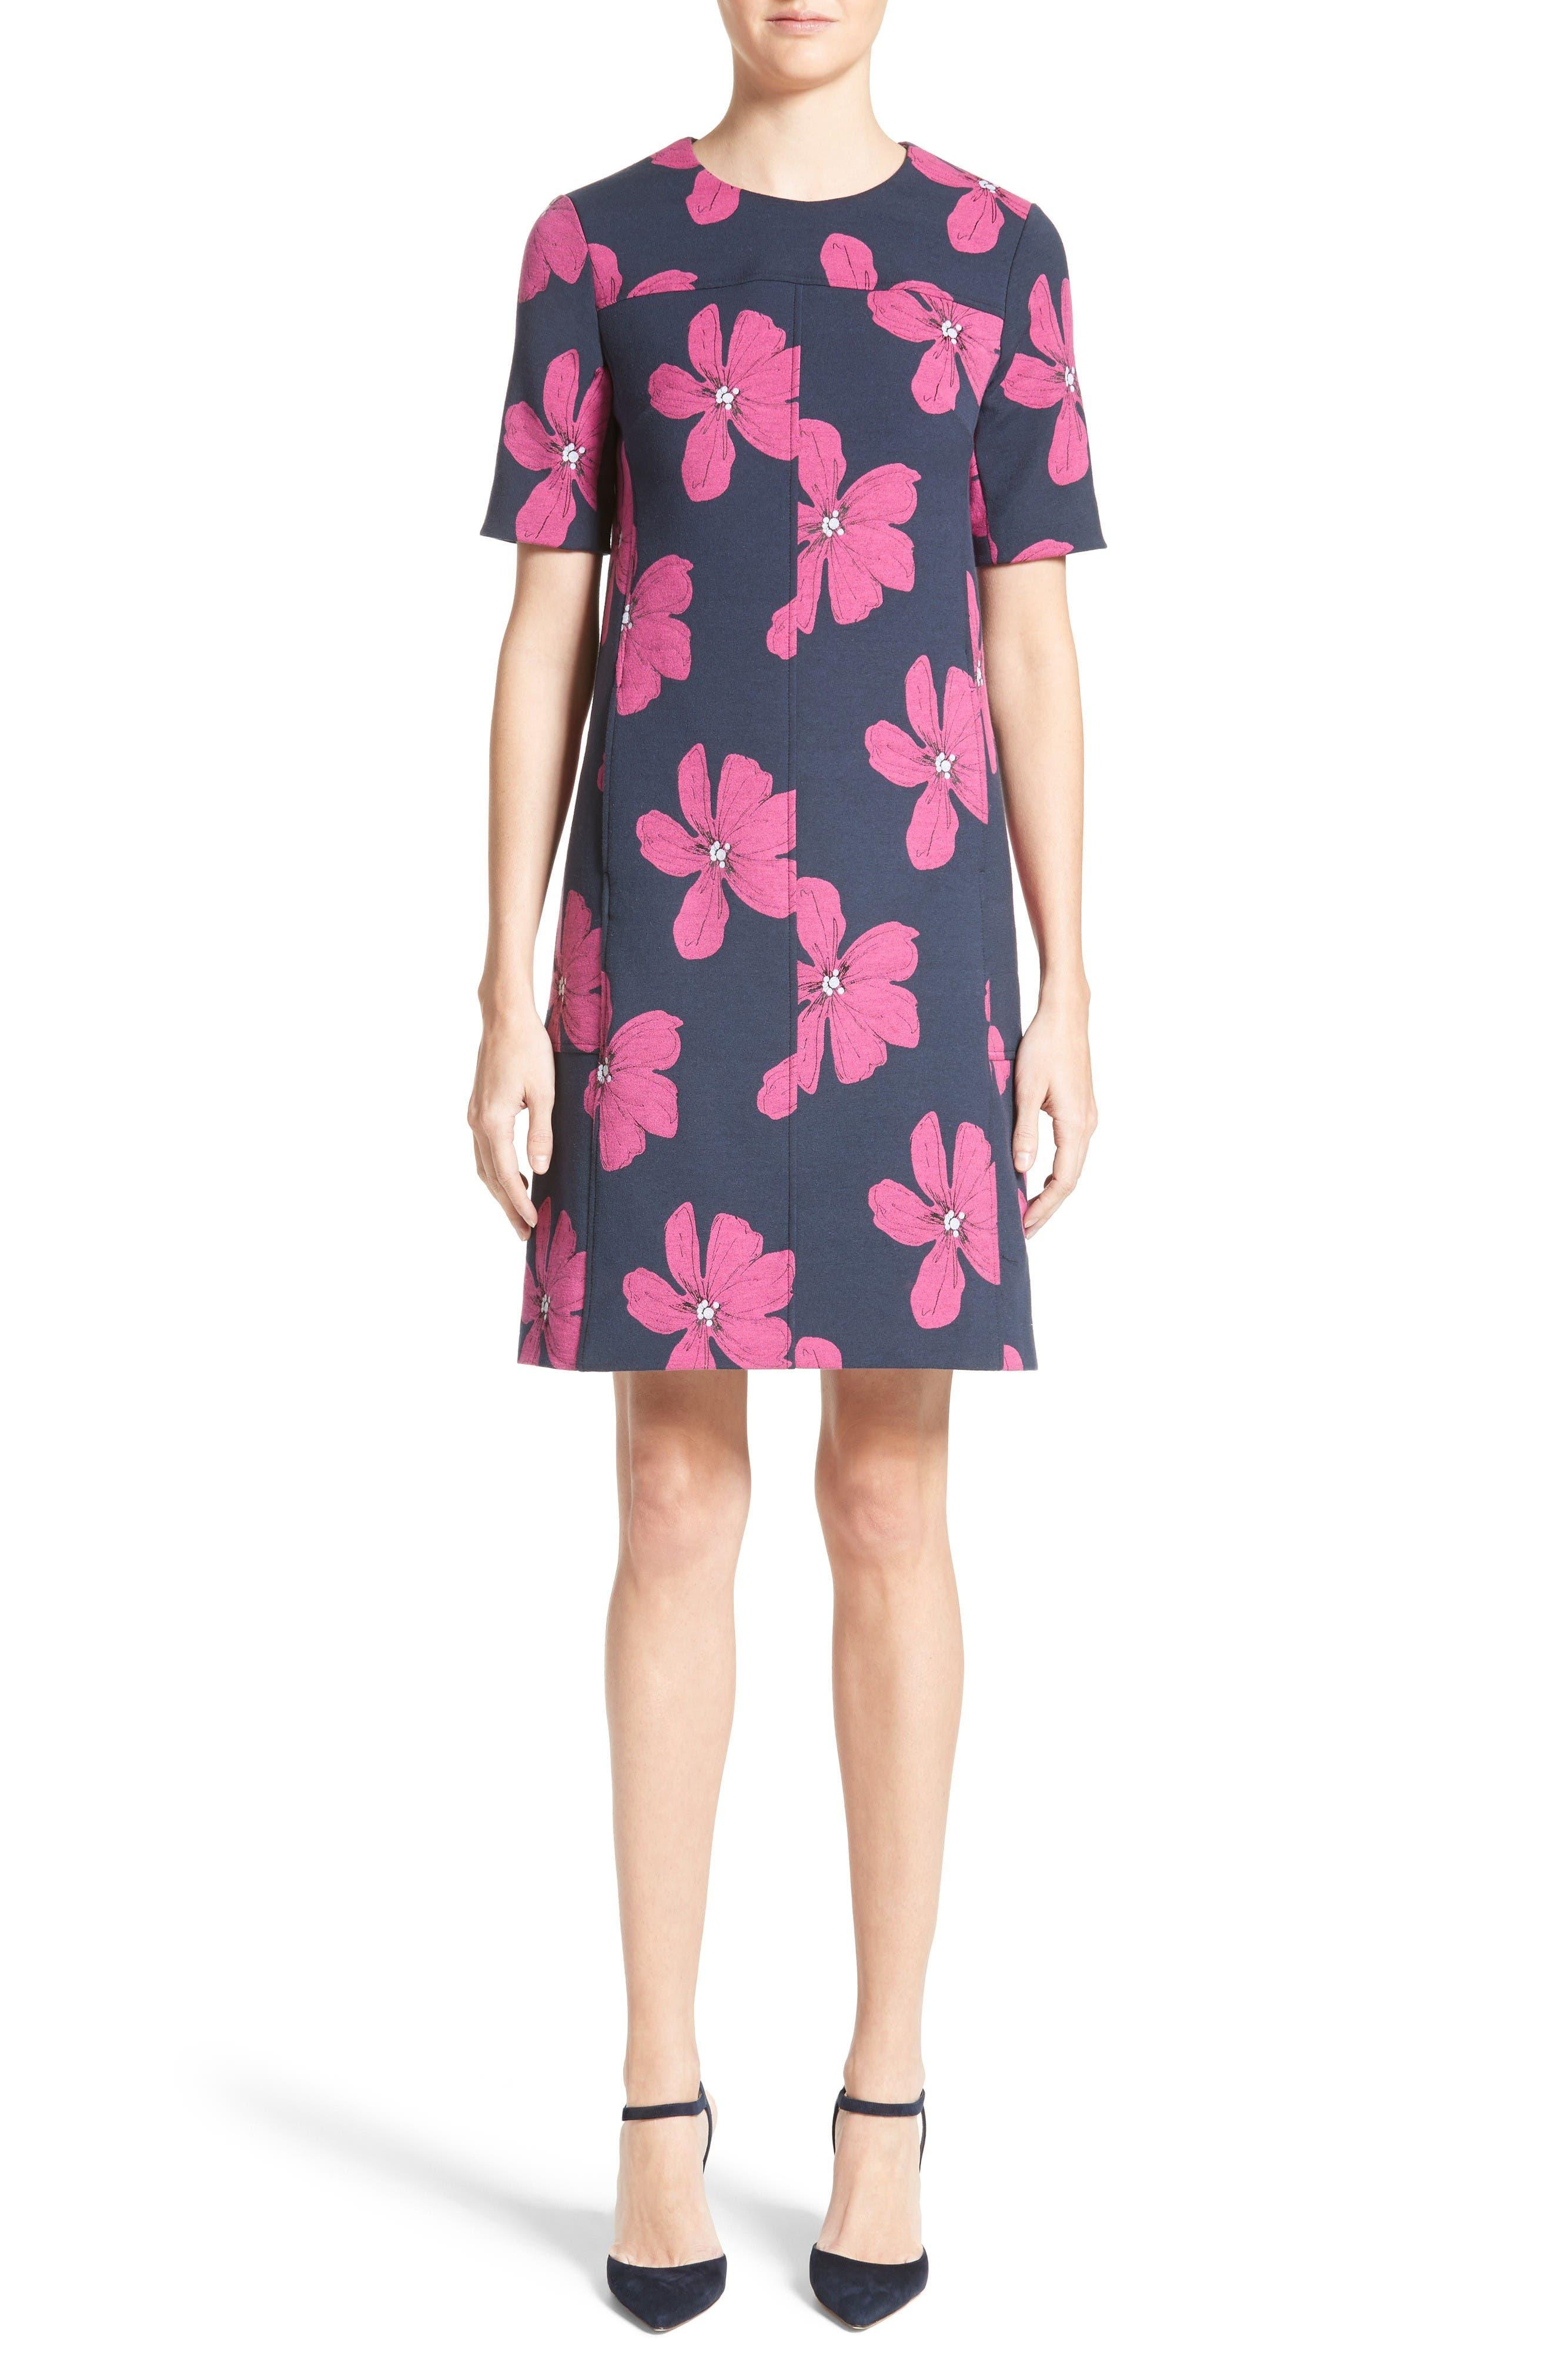 Floral Print Stretch Jacquard Tunic Dress,                         Main,                         color, Navy/ Fuchsia